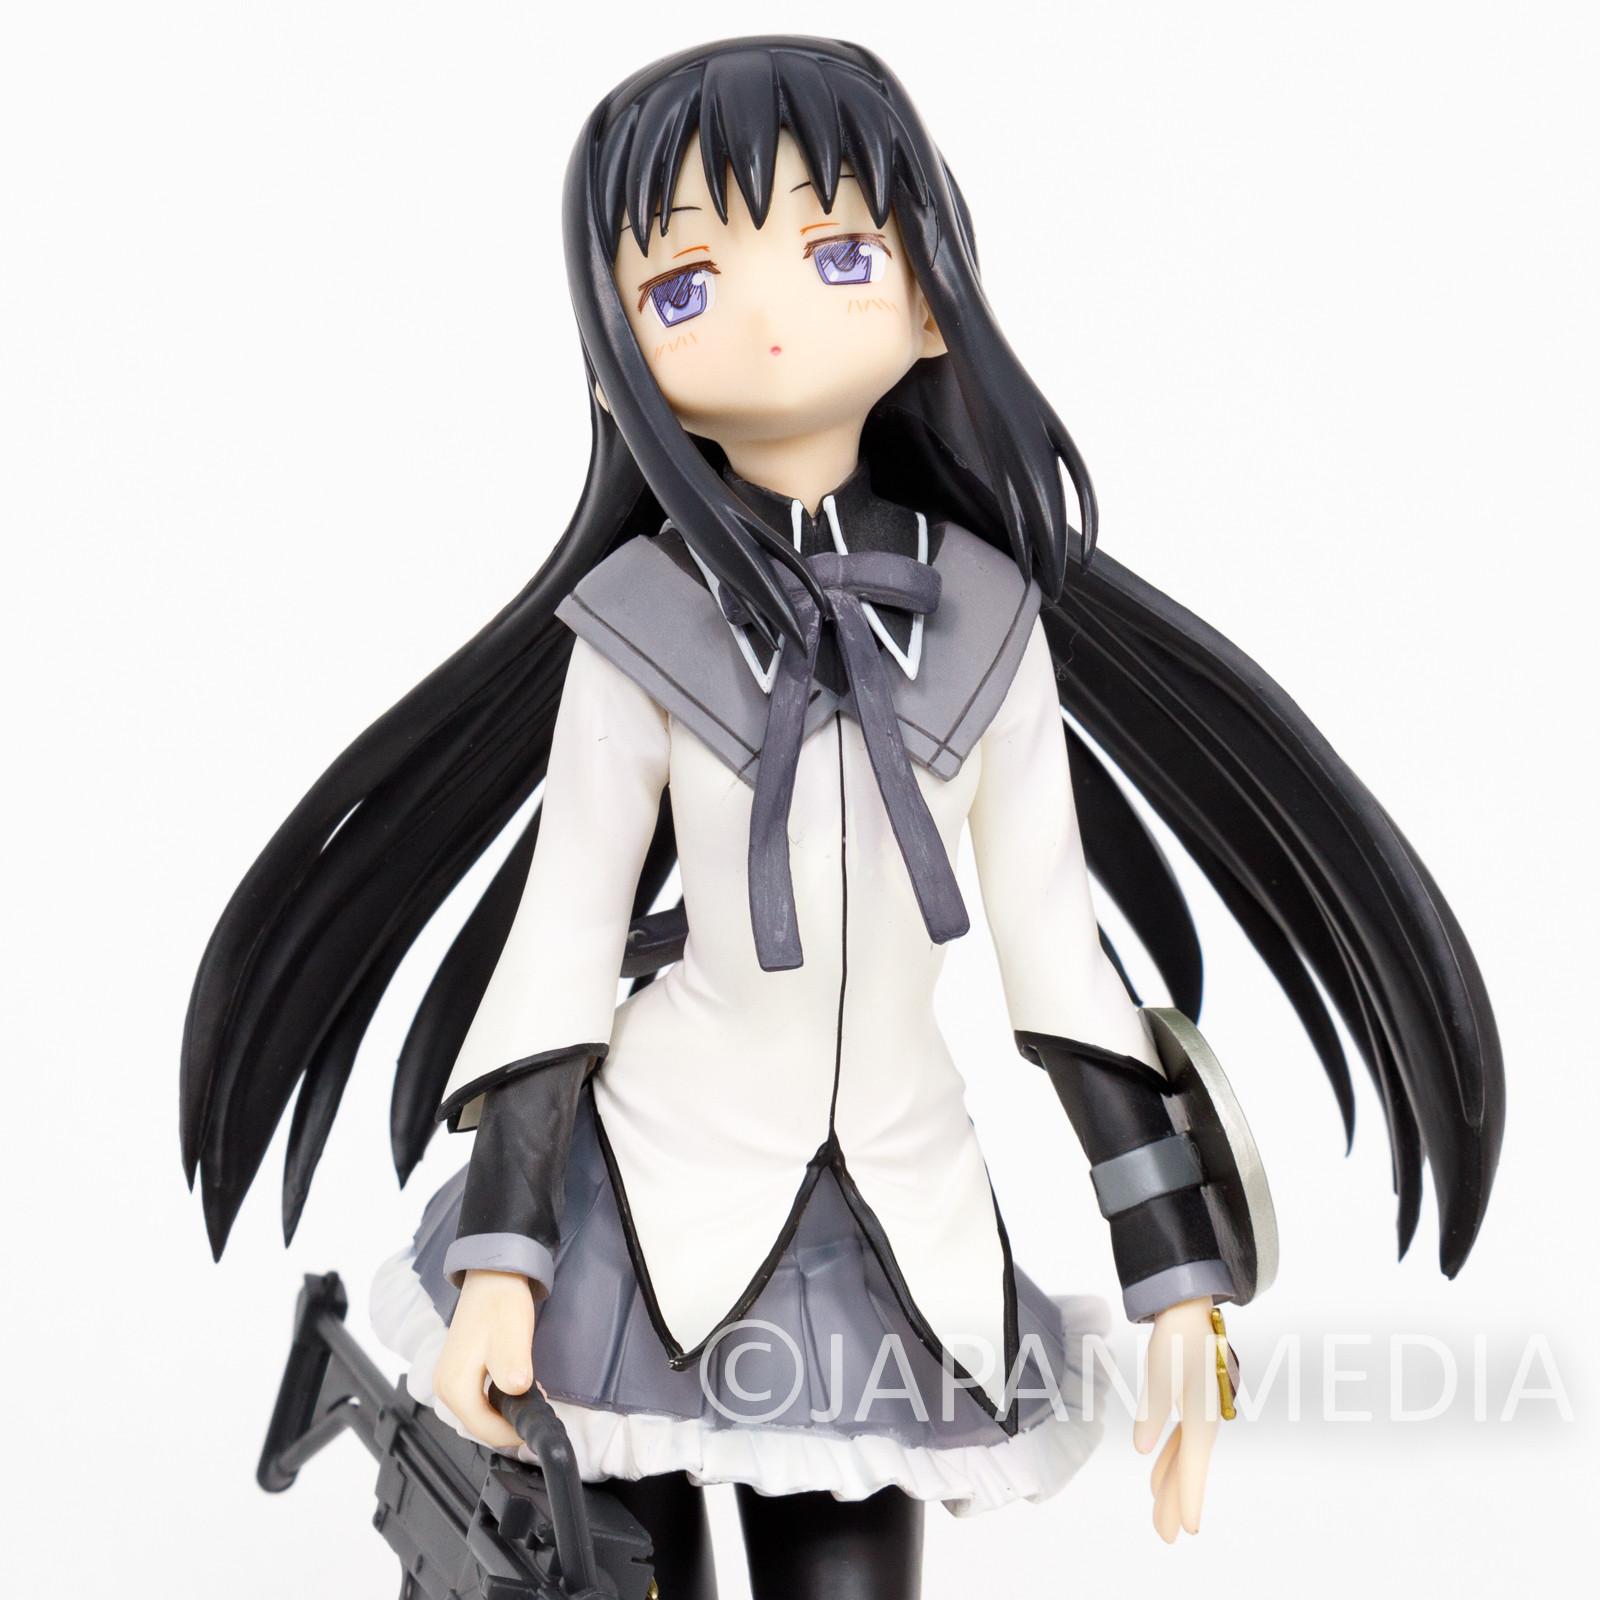 Puella Magi Madoka Magica Homura Akemi Battle Suit Figure Banpresto JAPAN